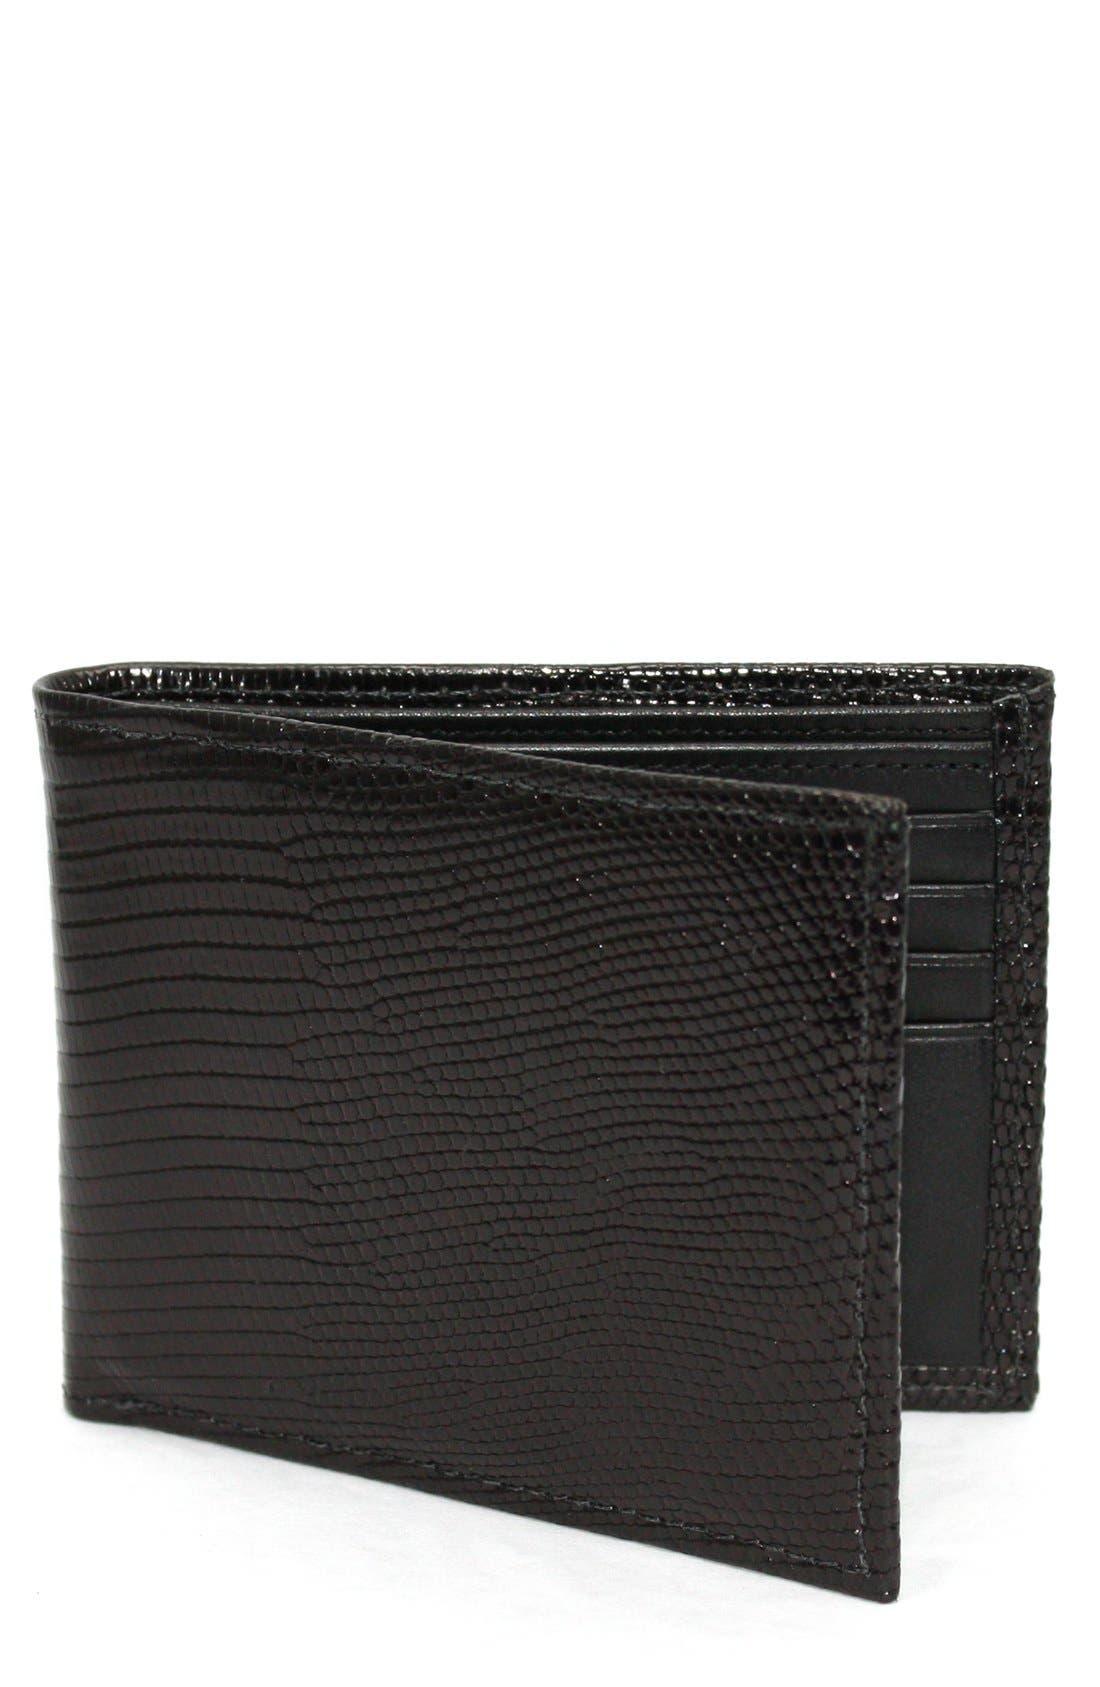 Alternate Image 1 Selected - Torino Belts Genuine Lizard Wallet